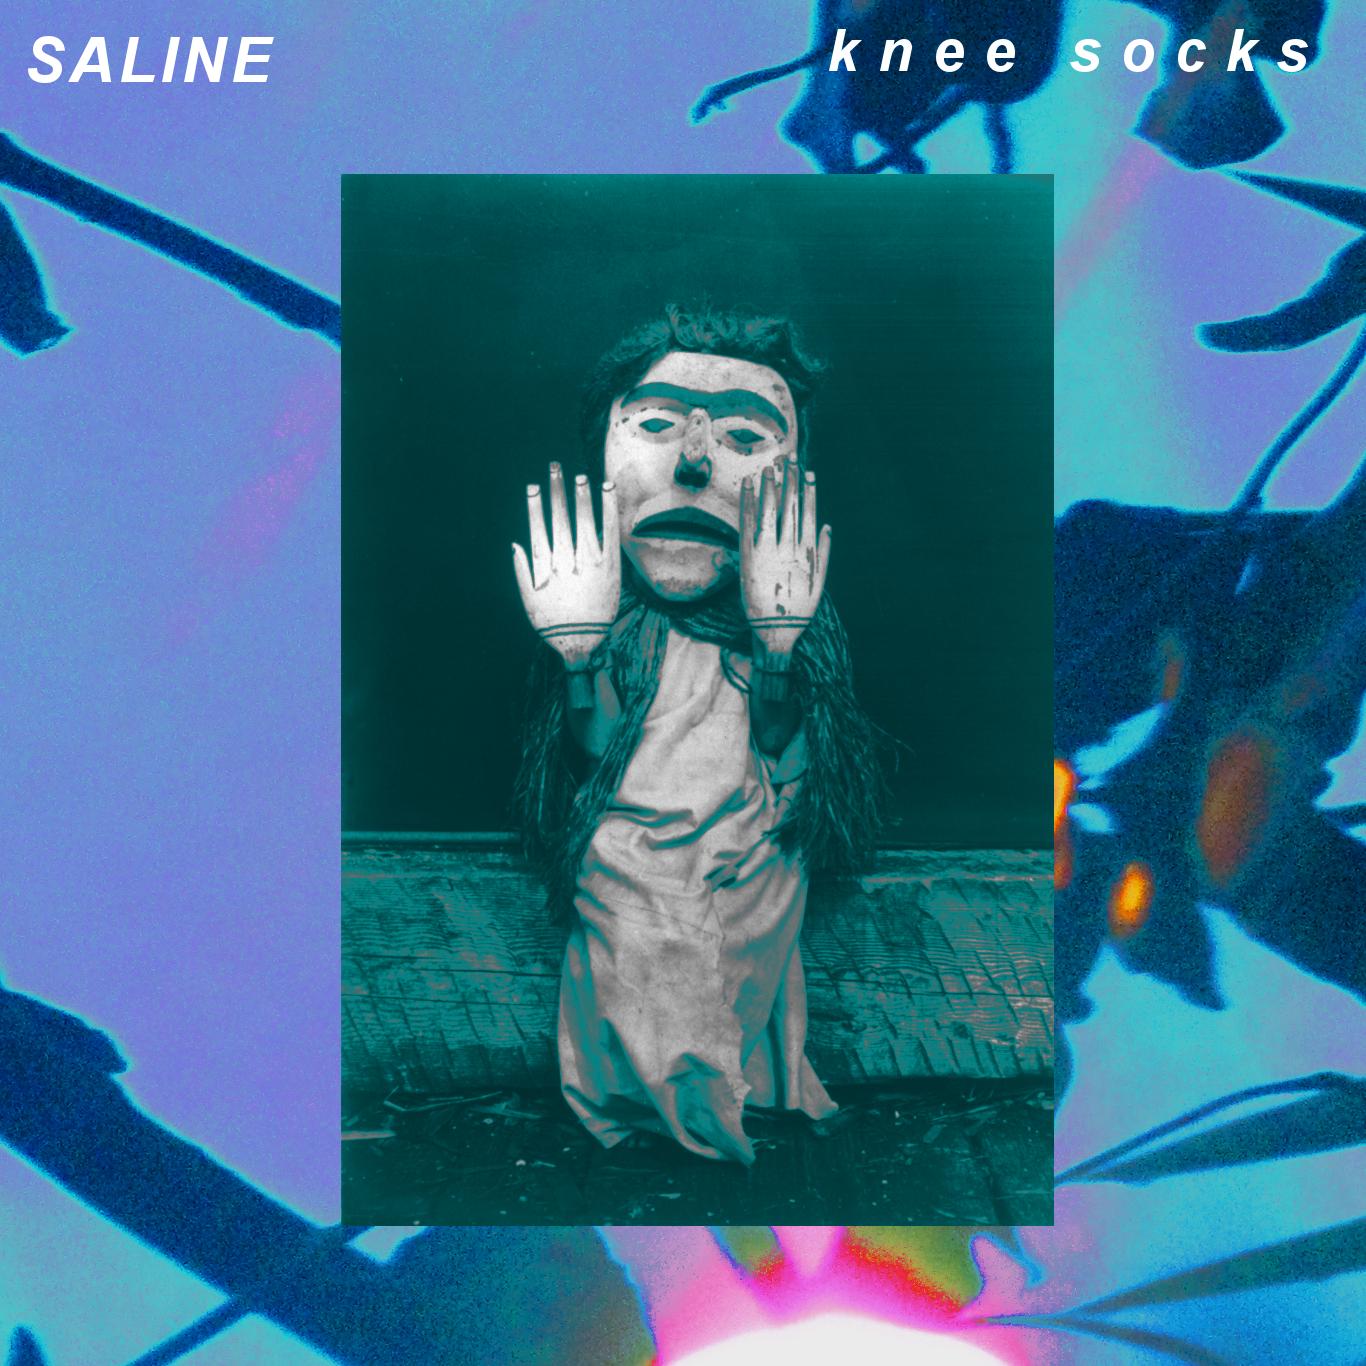 Saline_knee-socks_art.jpg